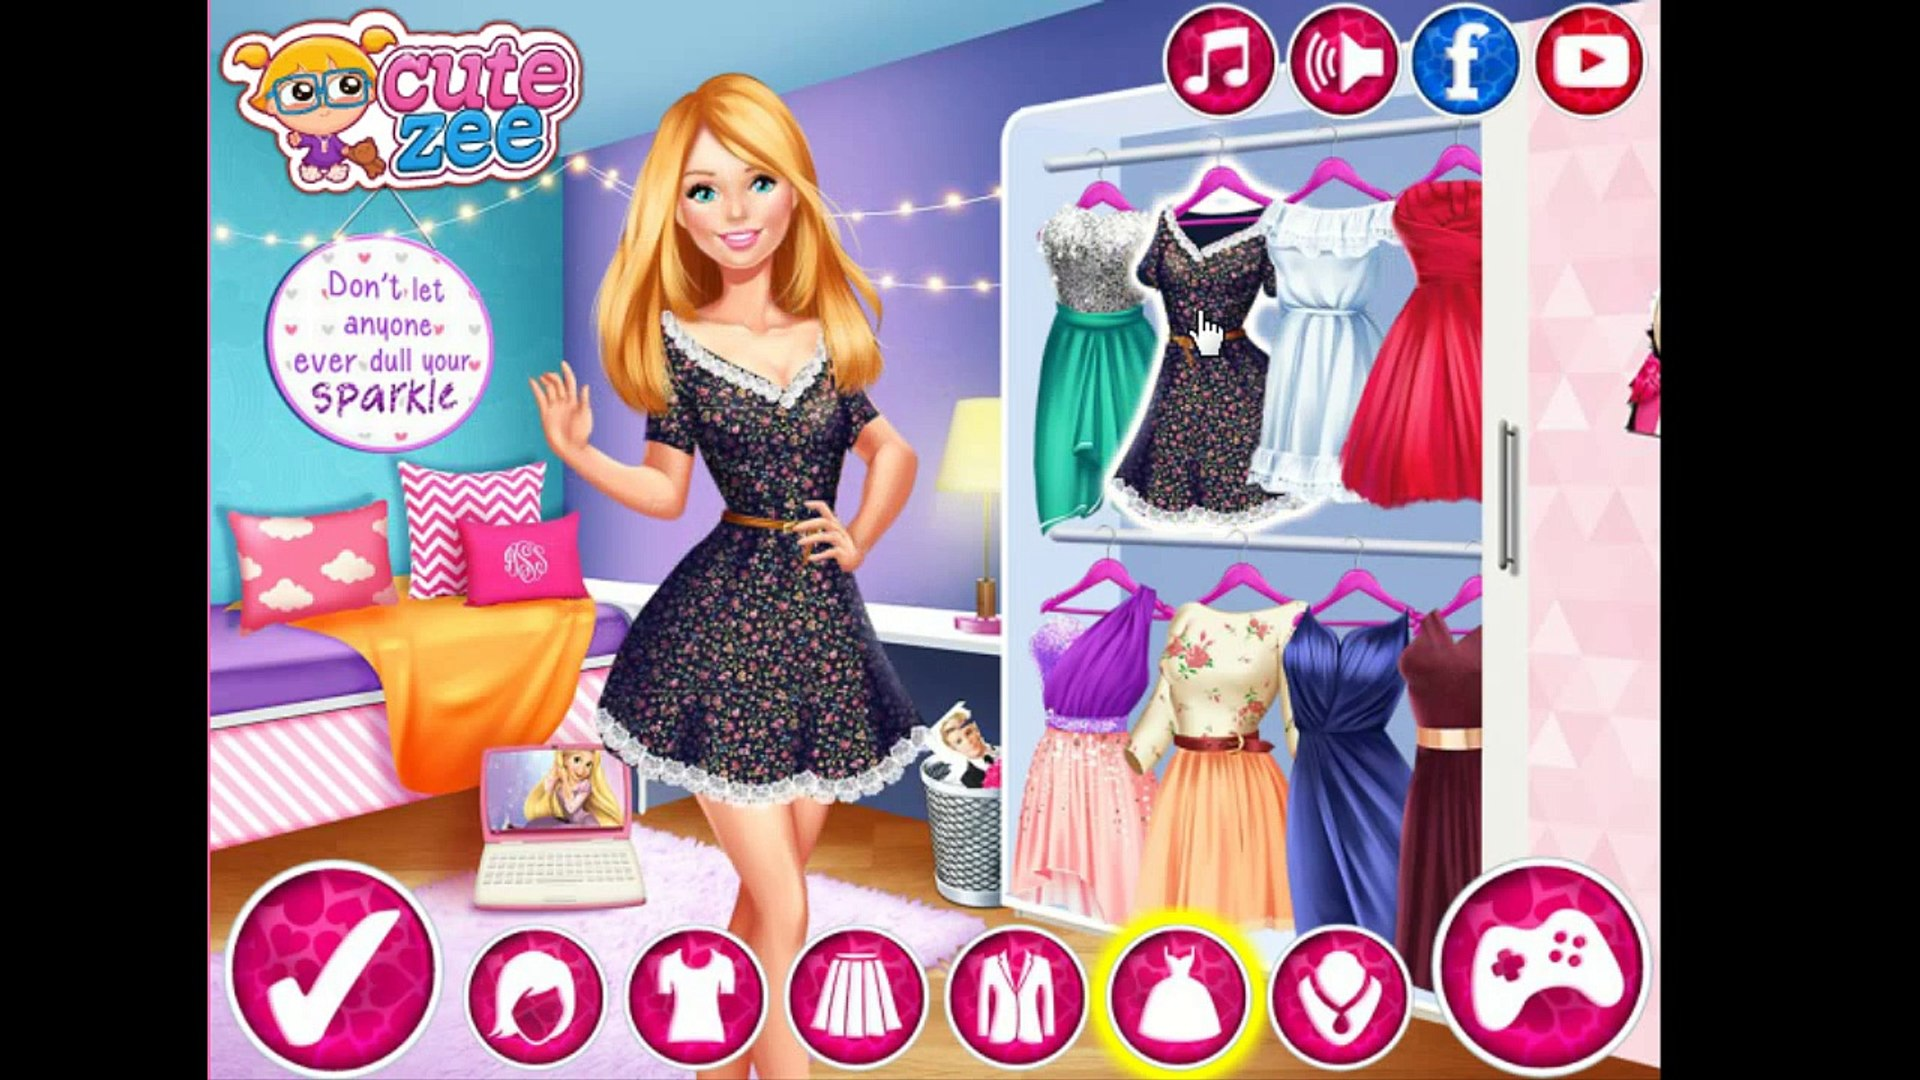 Barbie Blind Date, Barbie Date Crasher & Barbie at Hogwarts